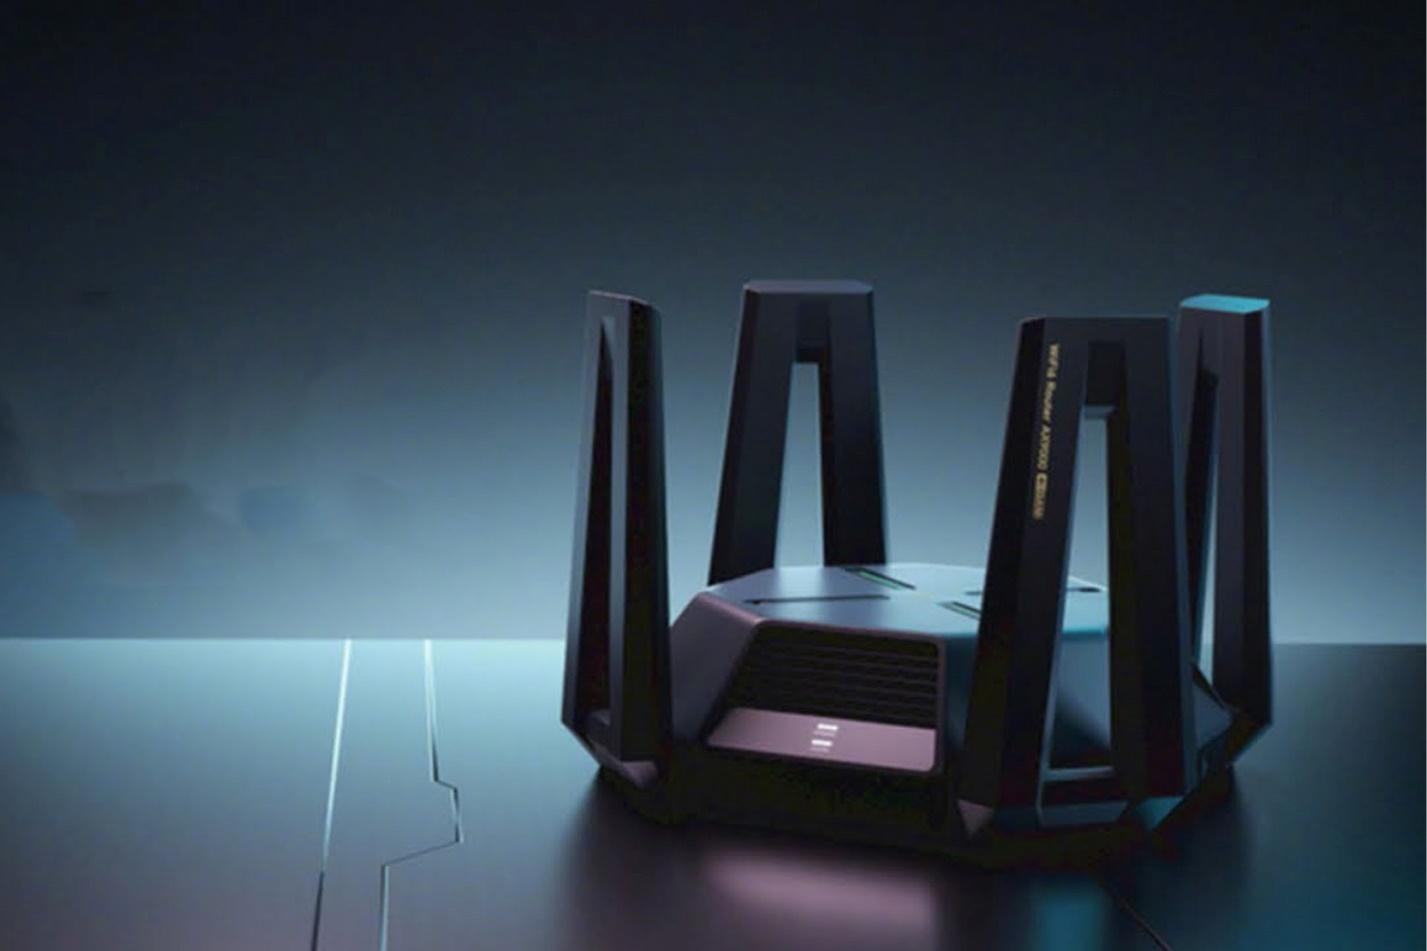 C:\Users\tnkala\Desktop\xiaomi-tri-band-mi-ax9000-gaming-wi-fi-router-front-left-view.jpg